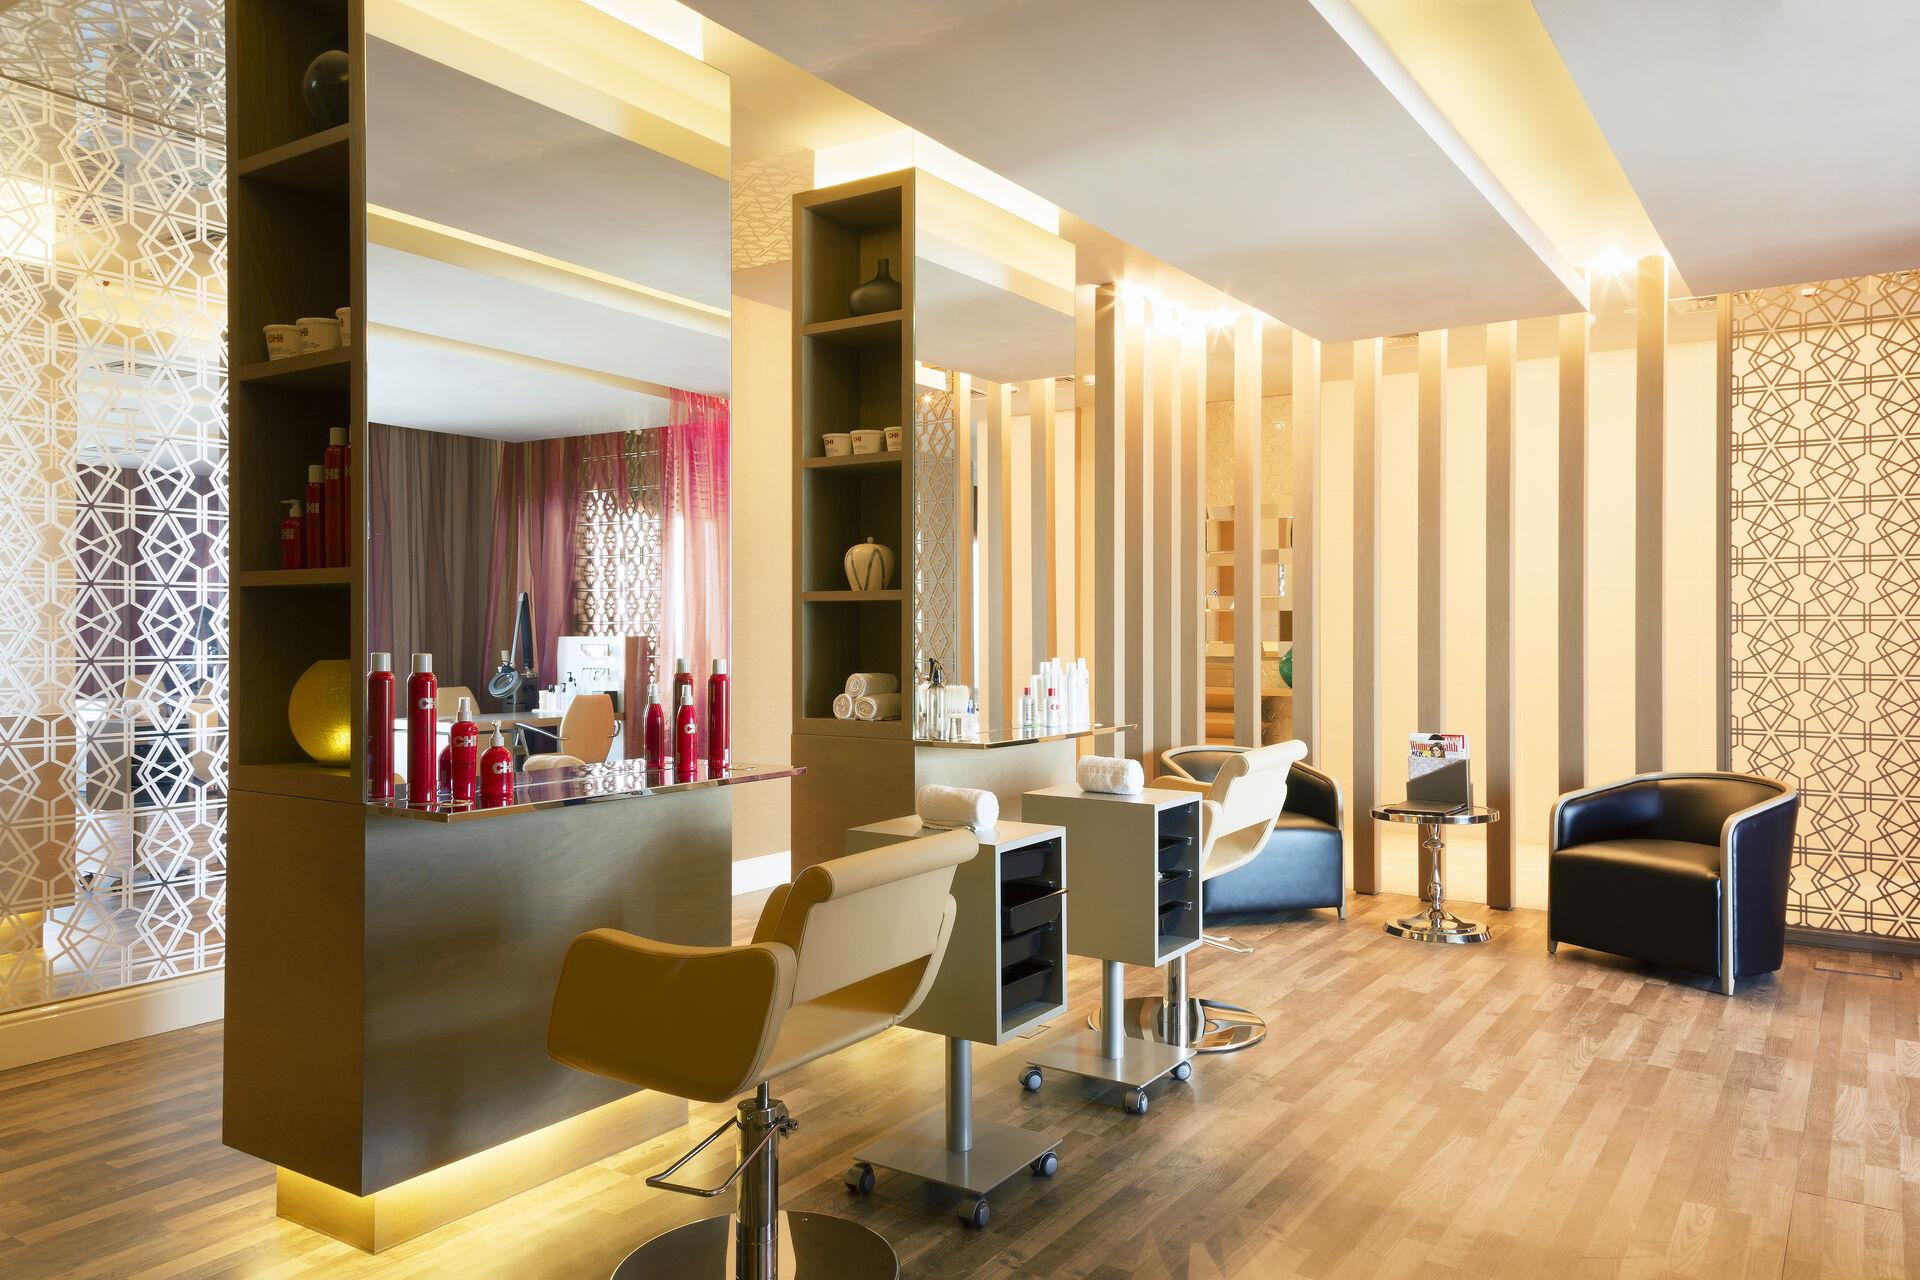 https://cms.satur.sk/data/imgs/tour_image/orig/goco-spa-ajman-beauty-salon-1960352.jpg